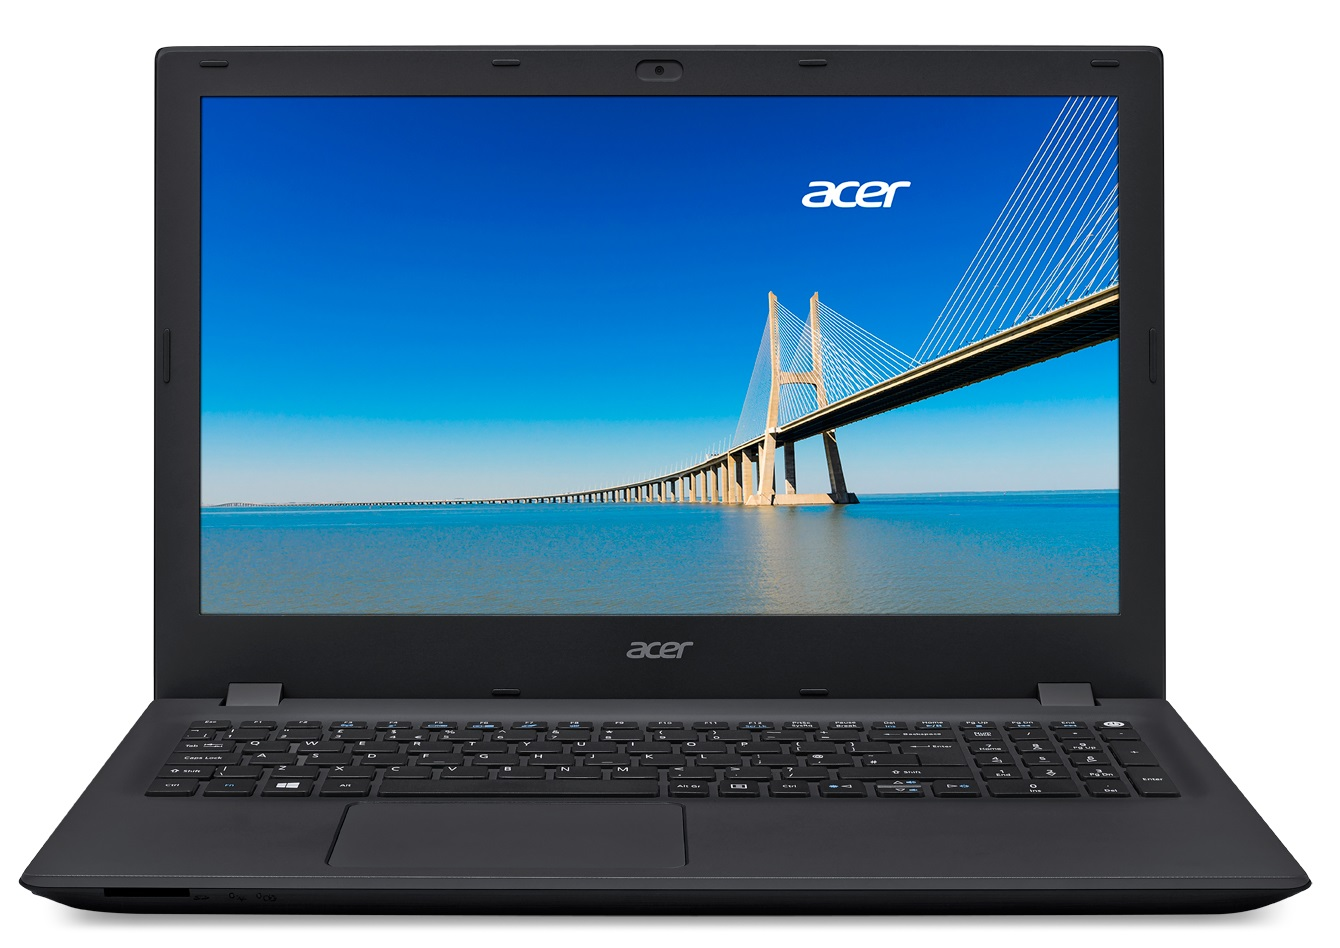 Acer EX2511G 15,6/3805U/500GB/4G/NV/DVD/W10